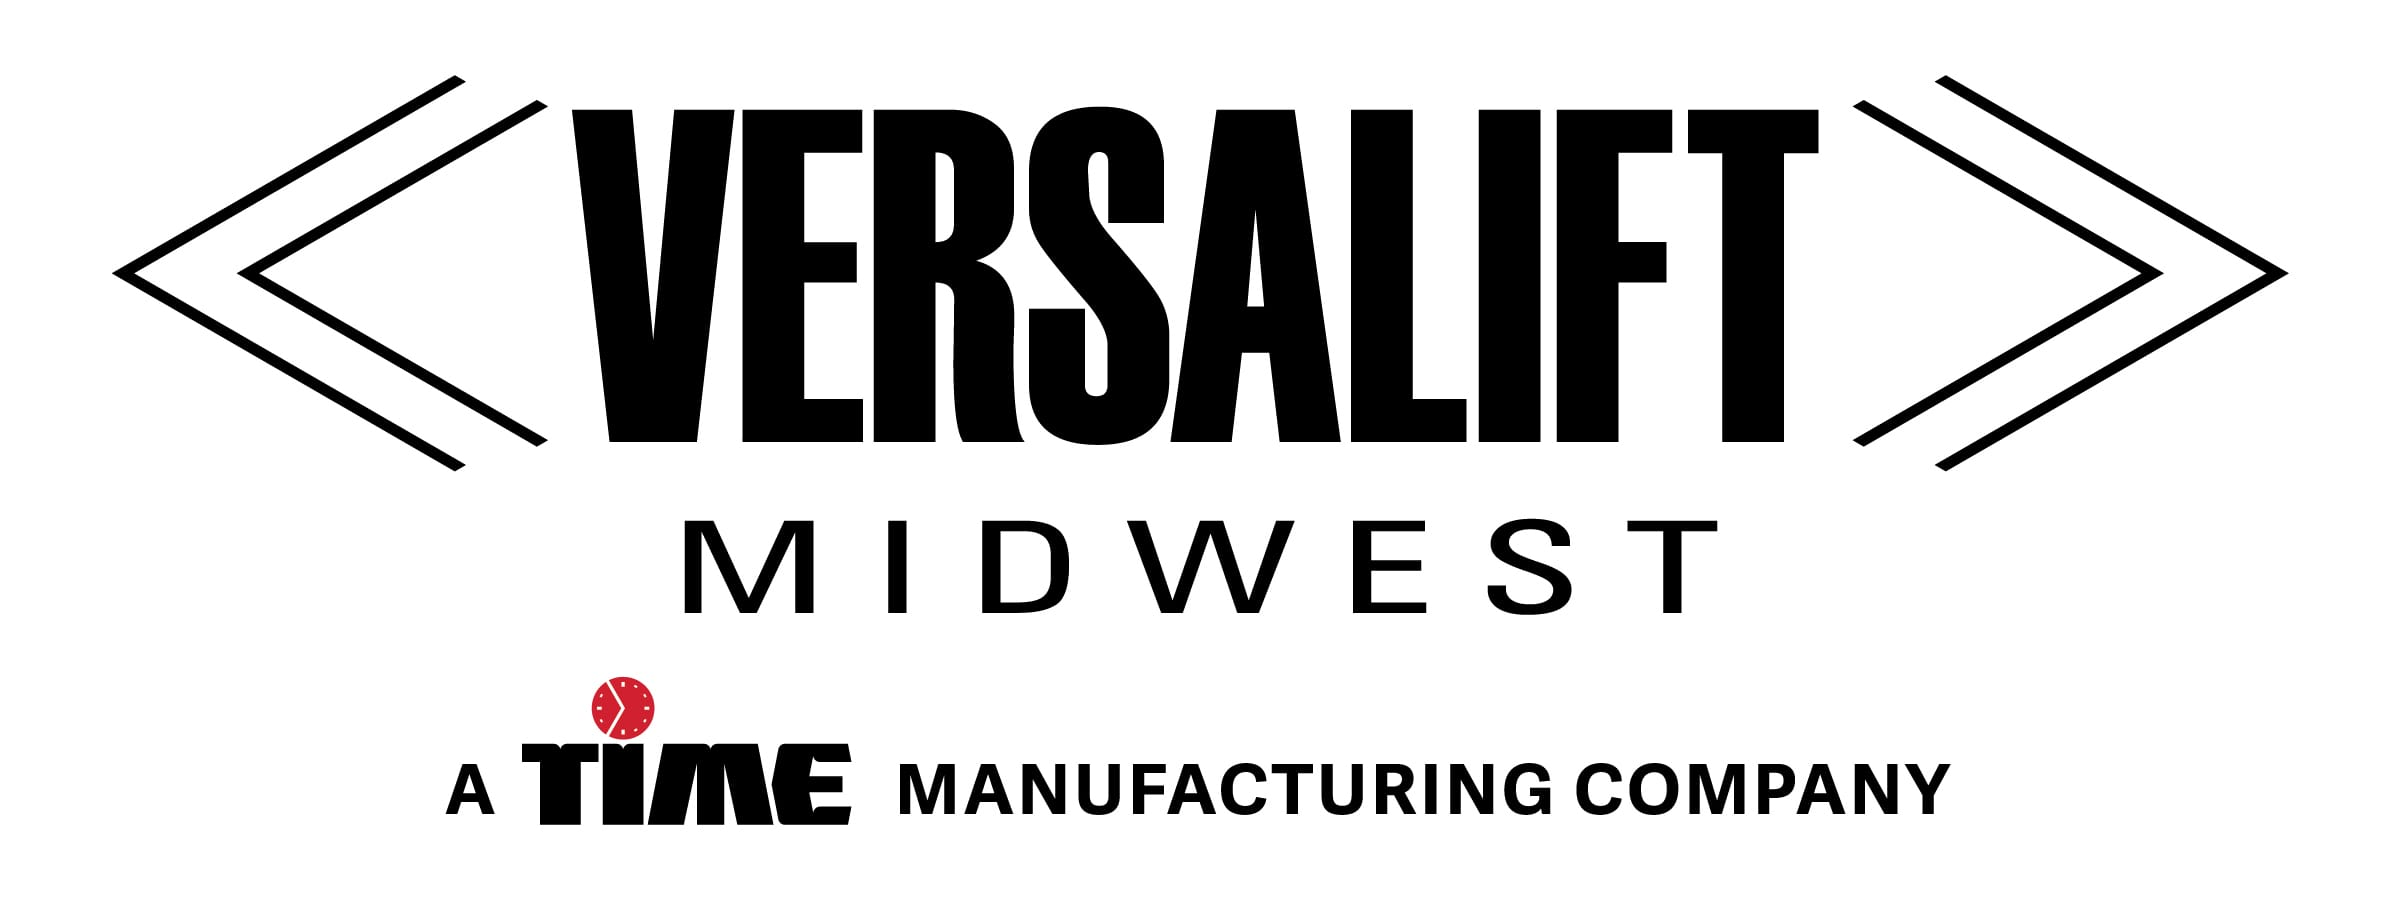 Versalift Acquires Cannon Truck Equipment, establishes